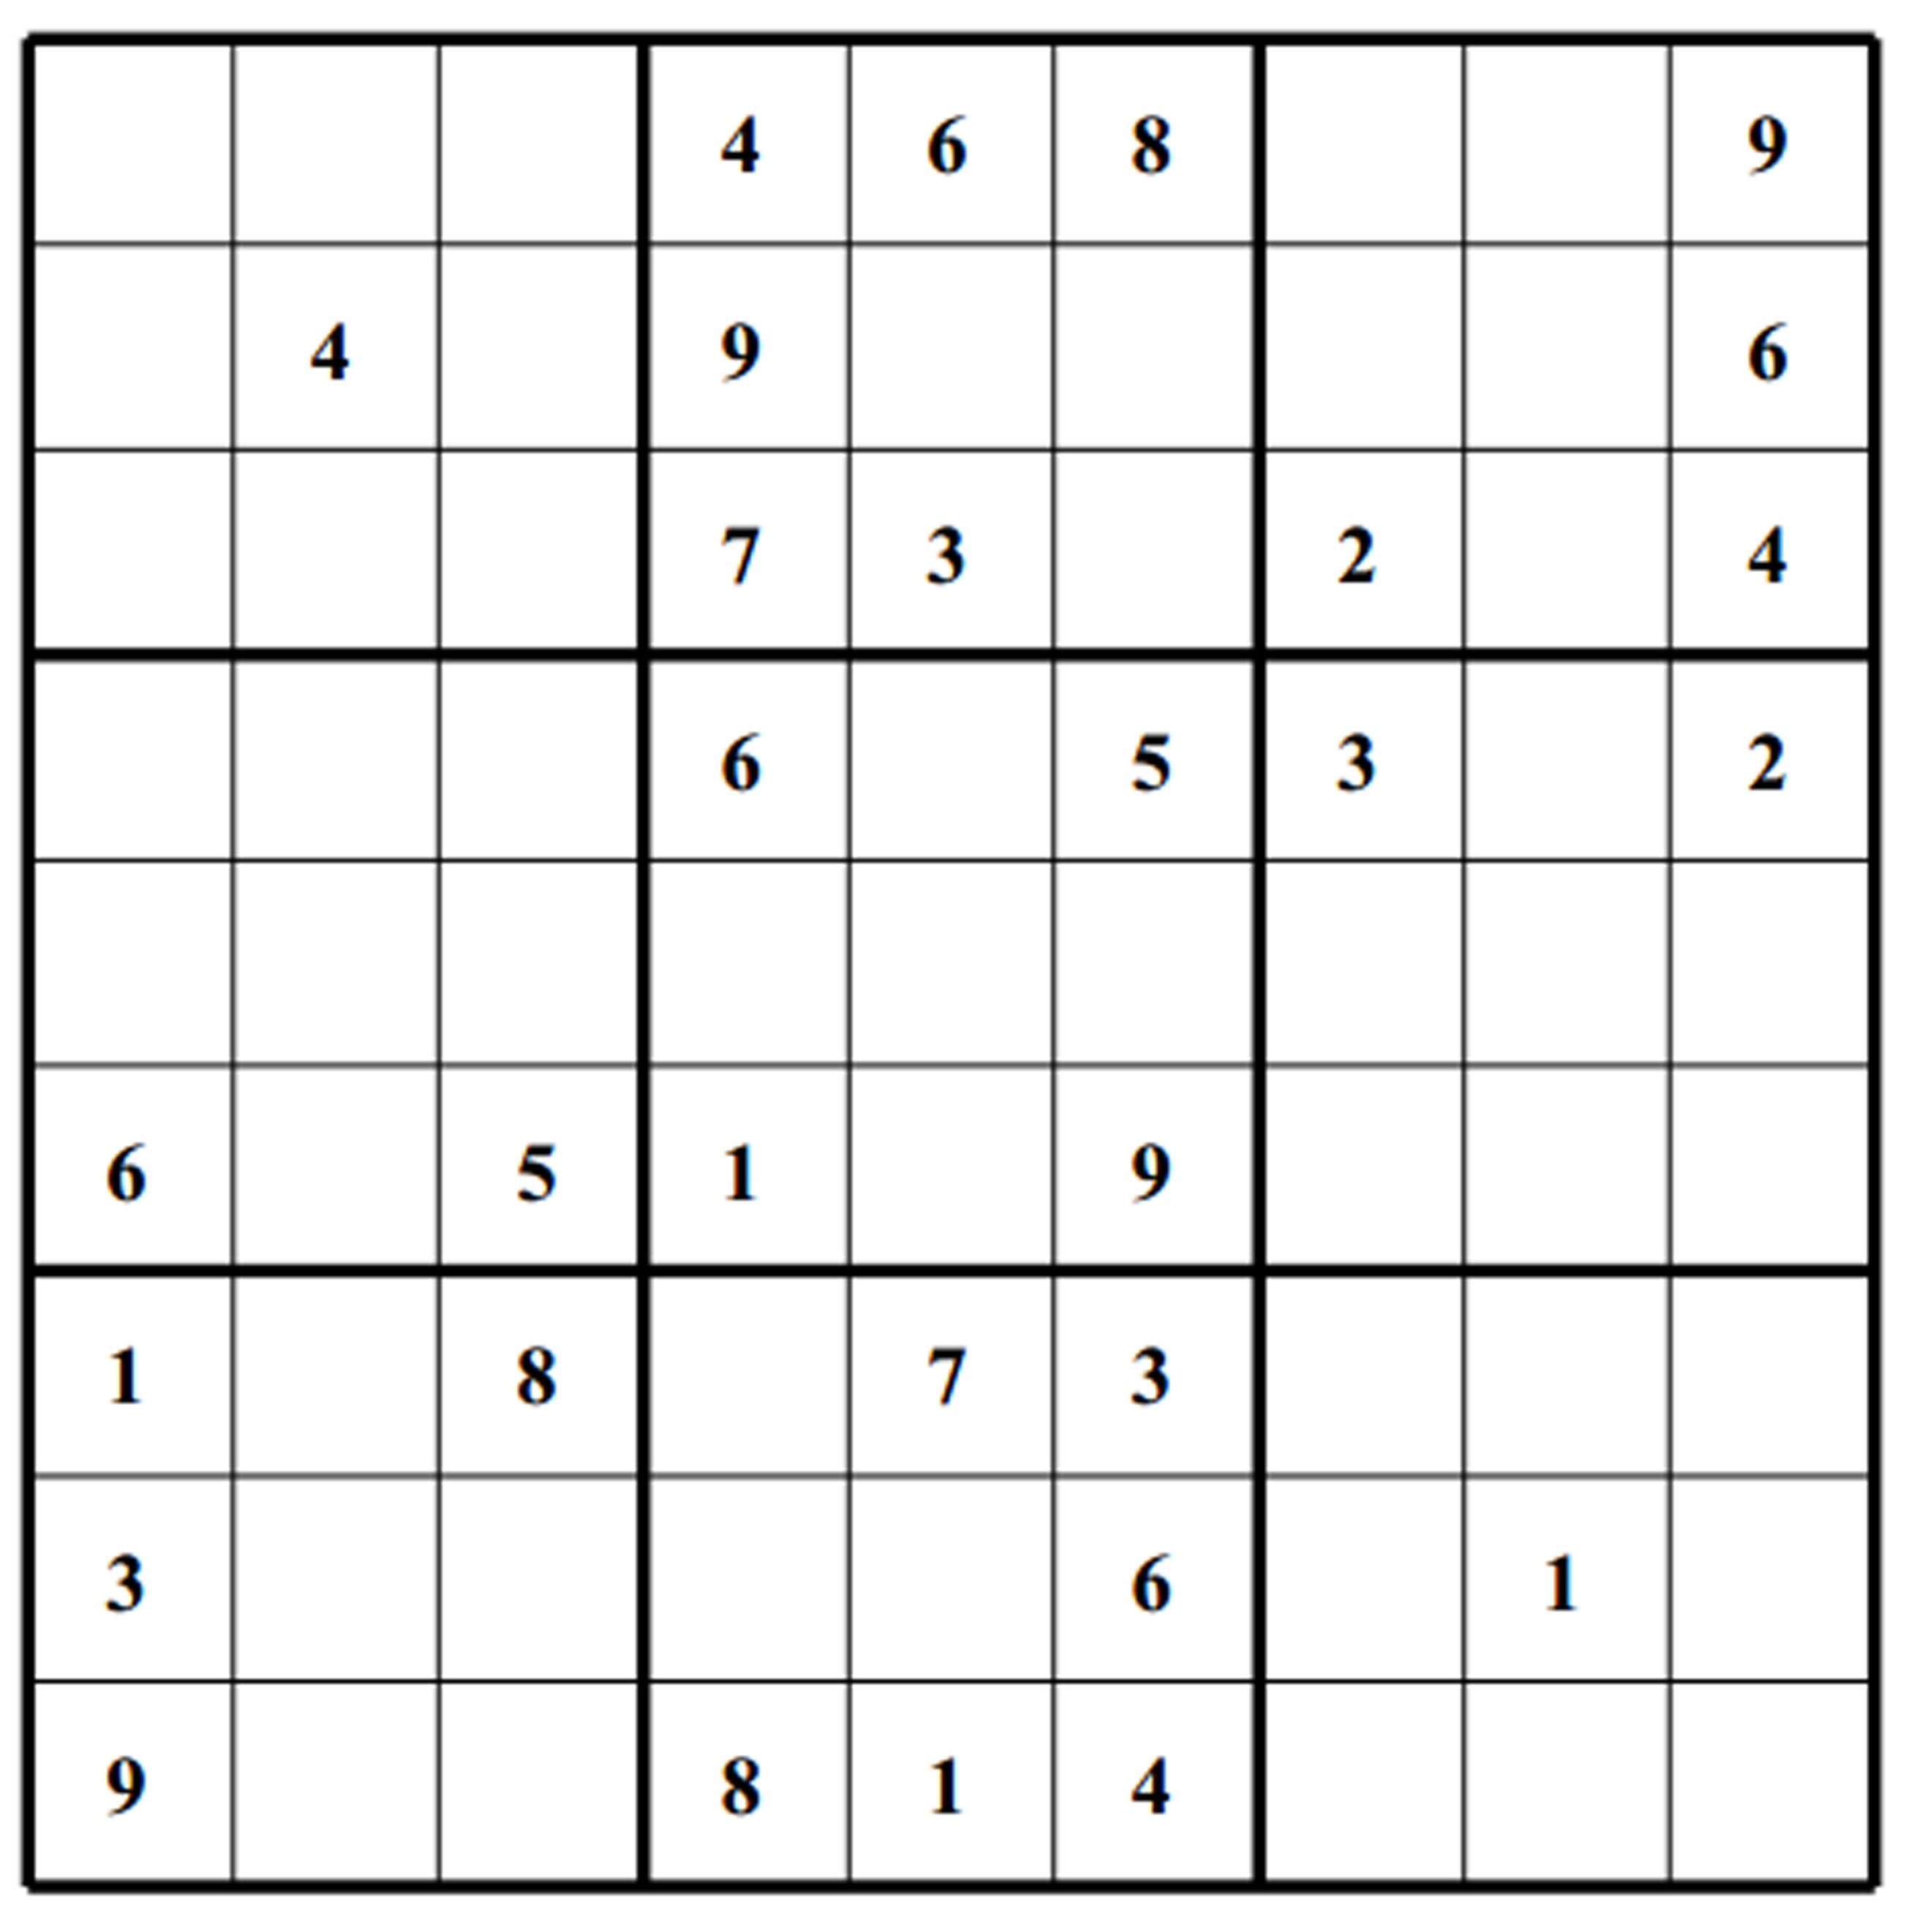 Very Hard Sudoku Puzzles Books 200 Puzzles Large Print 200 pour Sudoku Grande Section